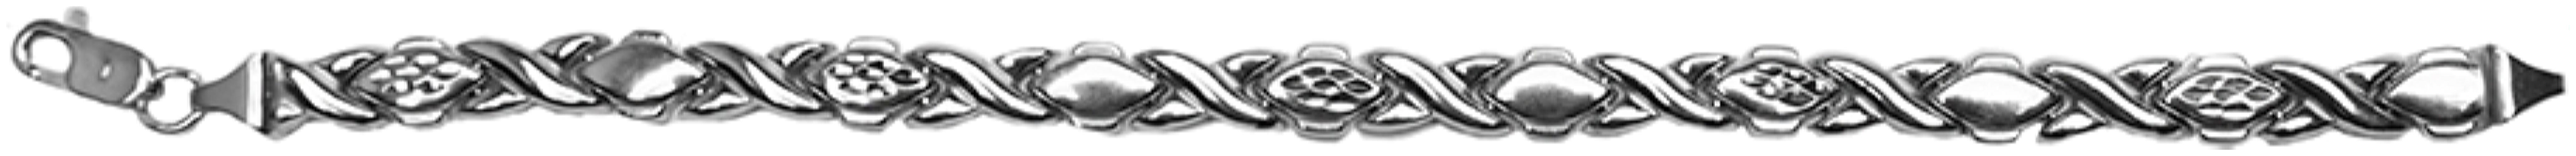 картинка браслет из серебра 925° 5105386РА